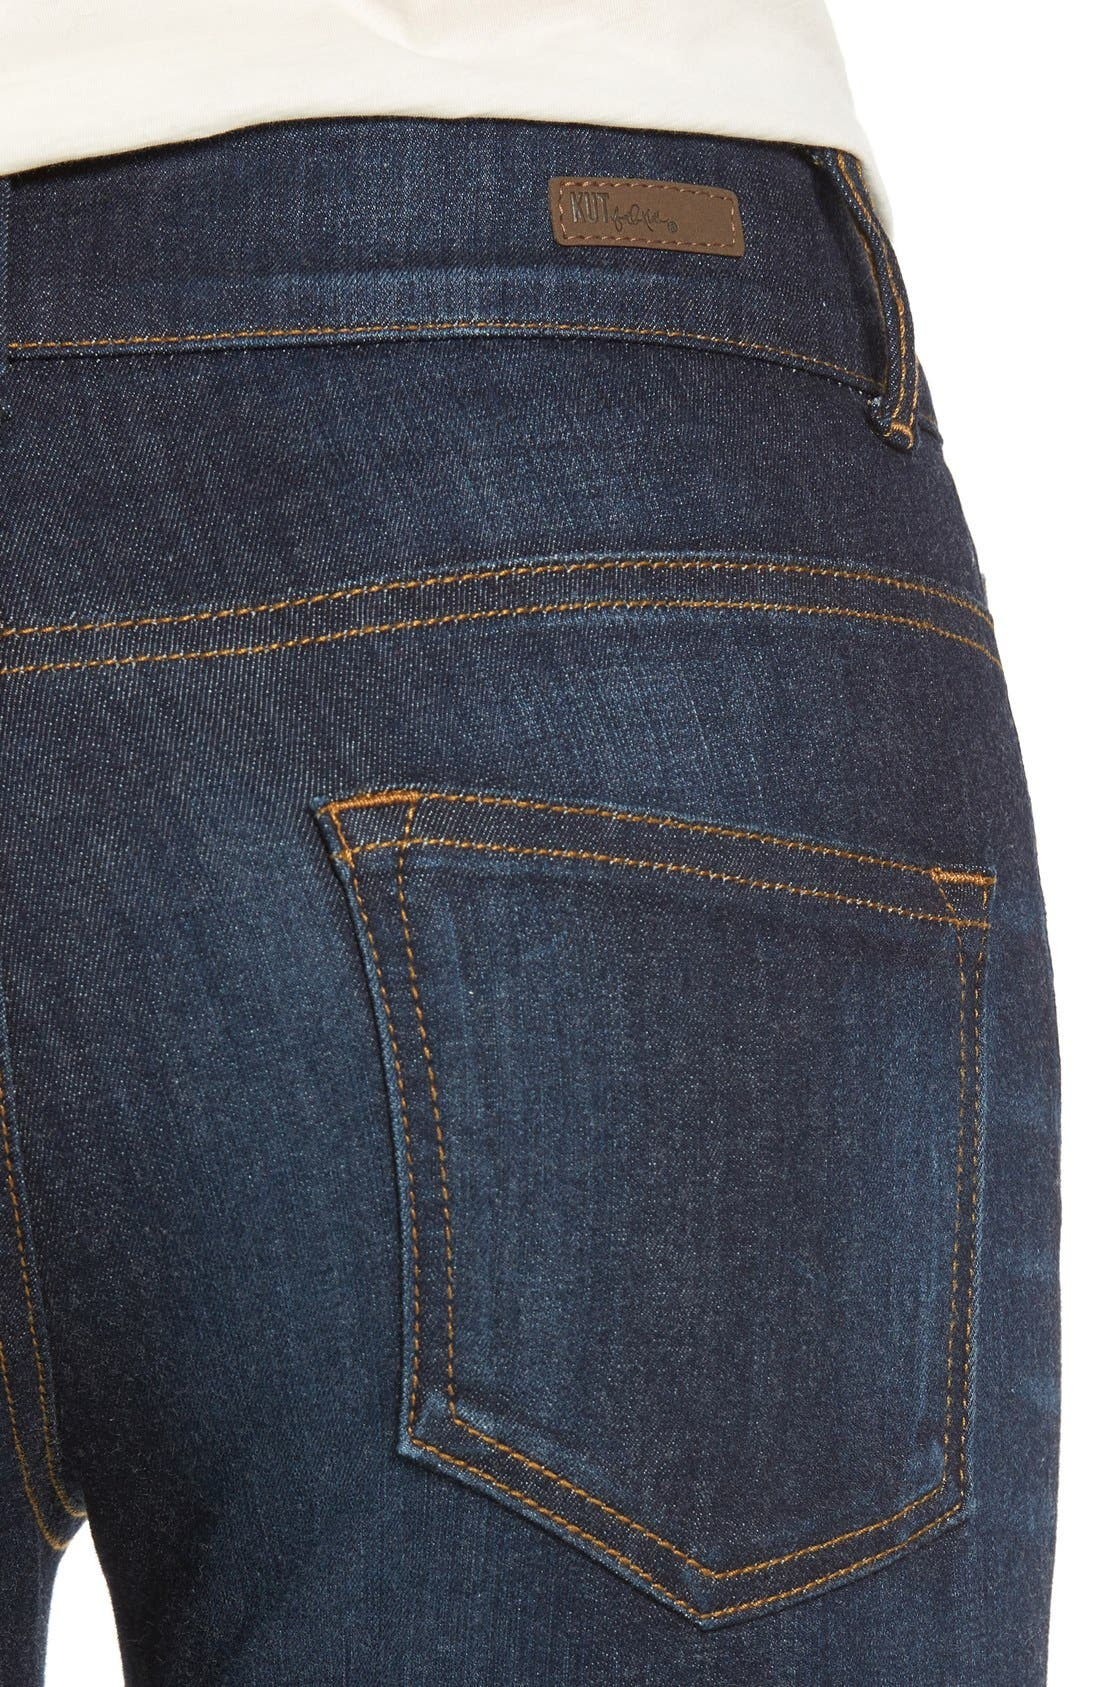 Alternate Image 4  - KUT from the Kloth 'Chrissy' Flare Leg Jeans (Brightness)